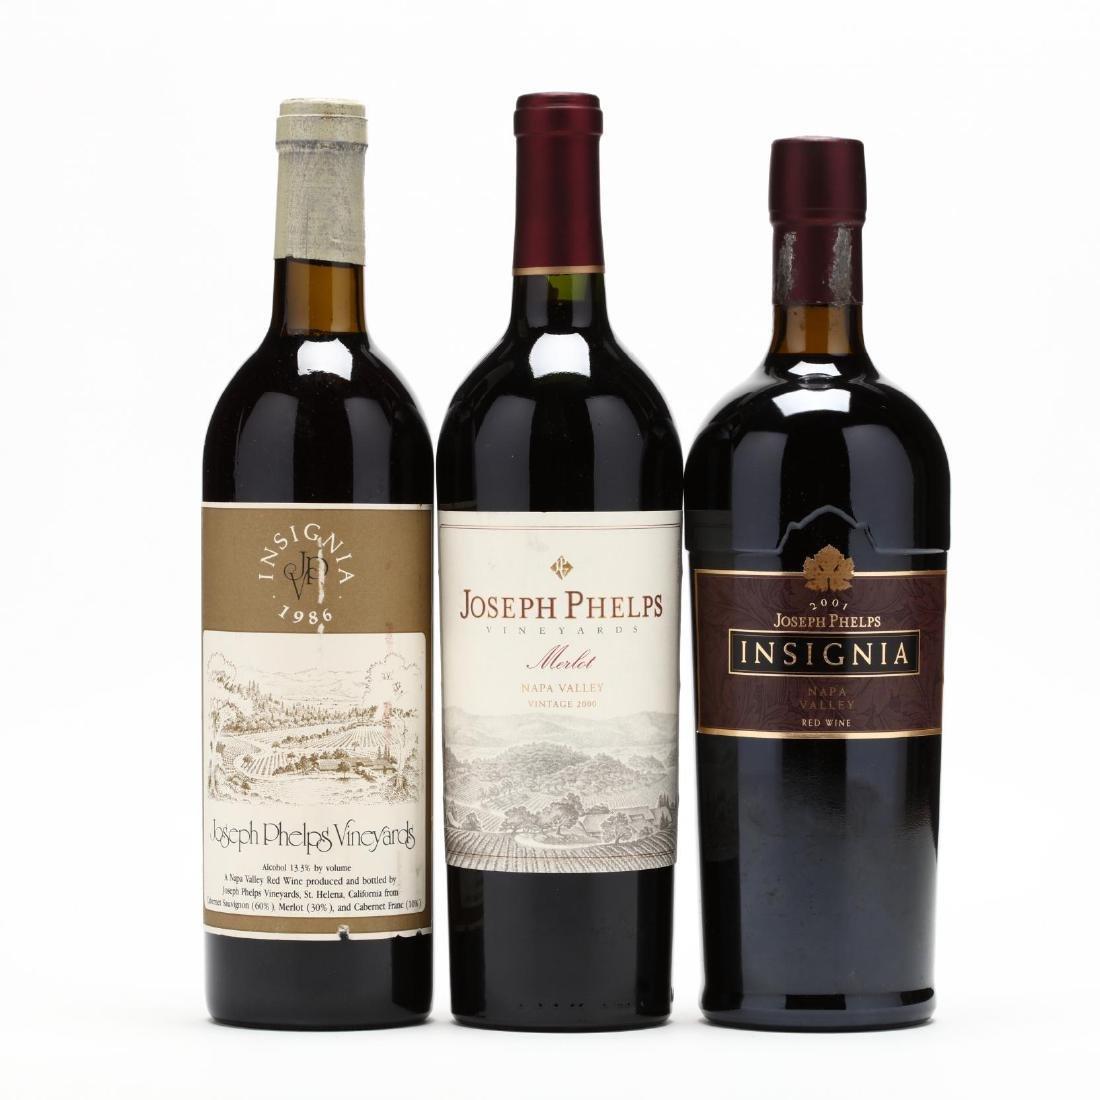 1986, 2001 & 2000 Joseph Phelps Vineyards